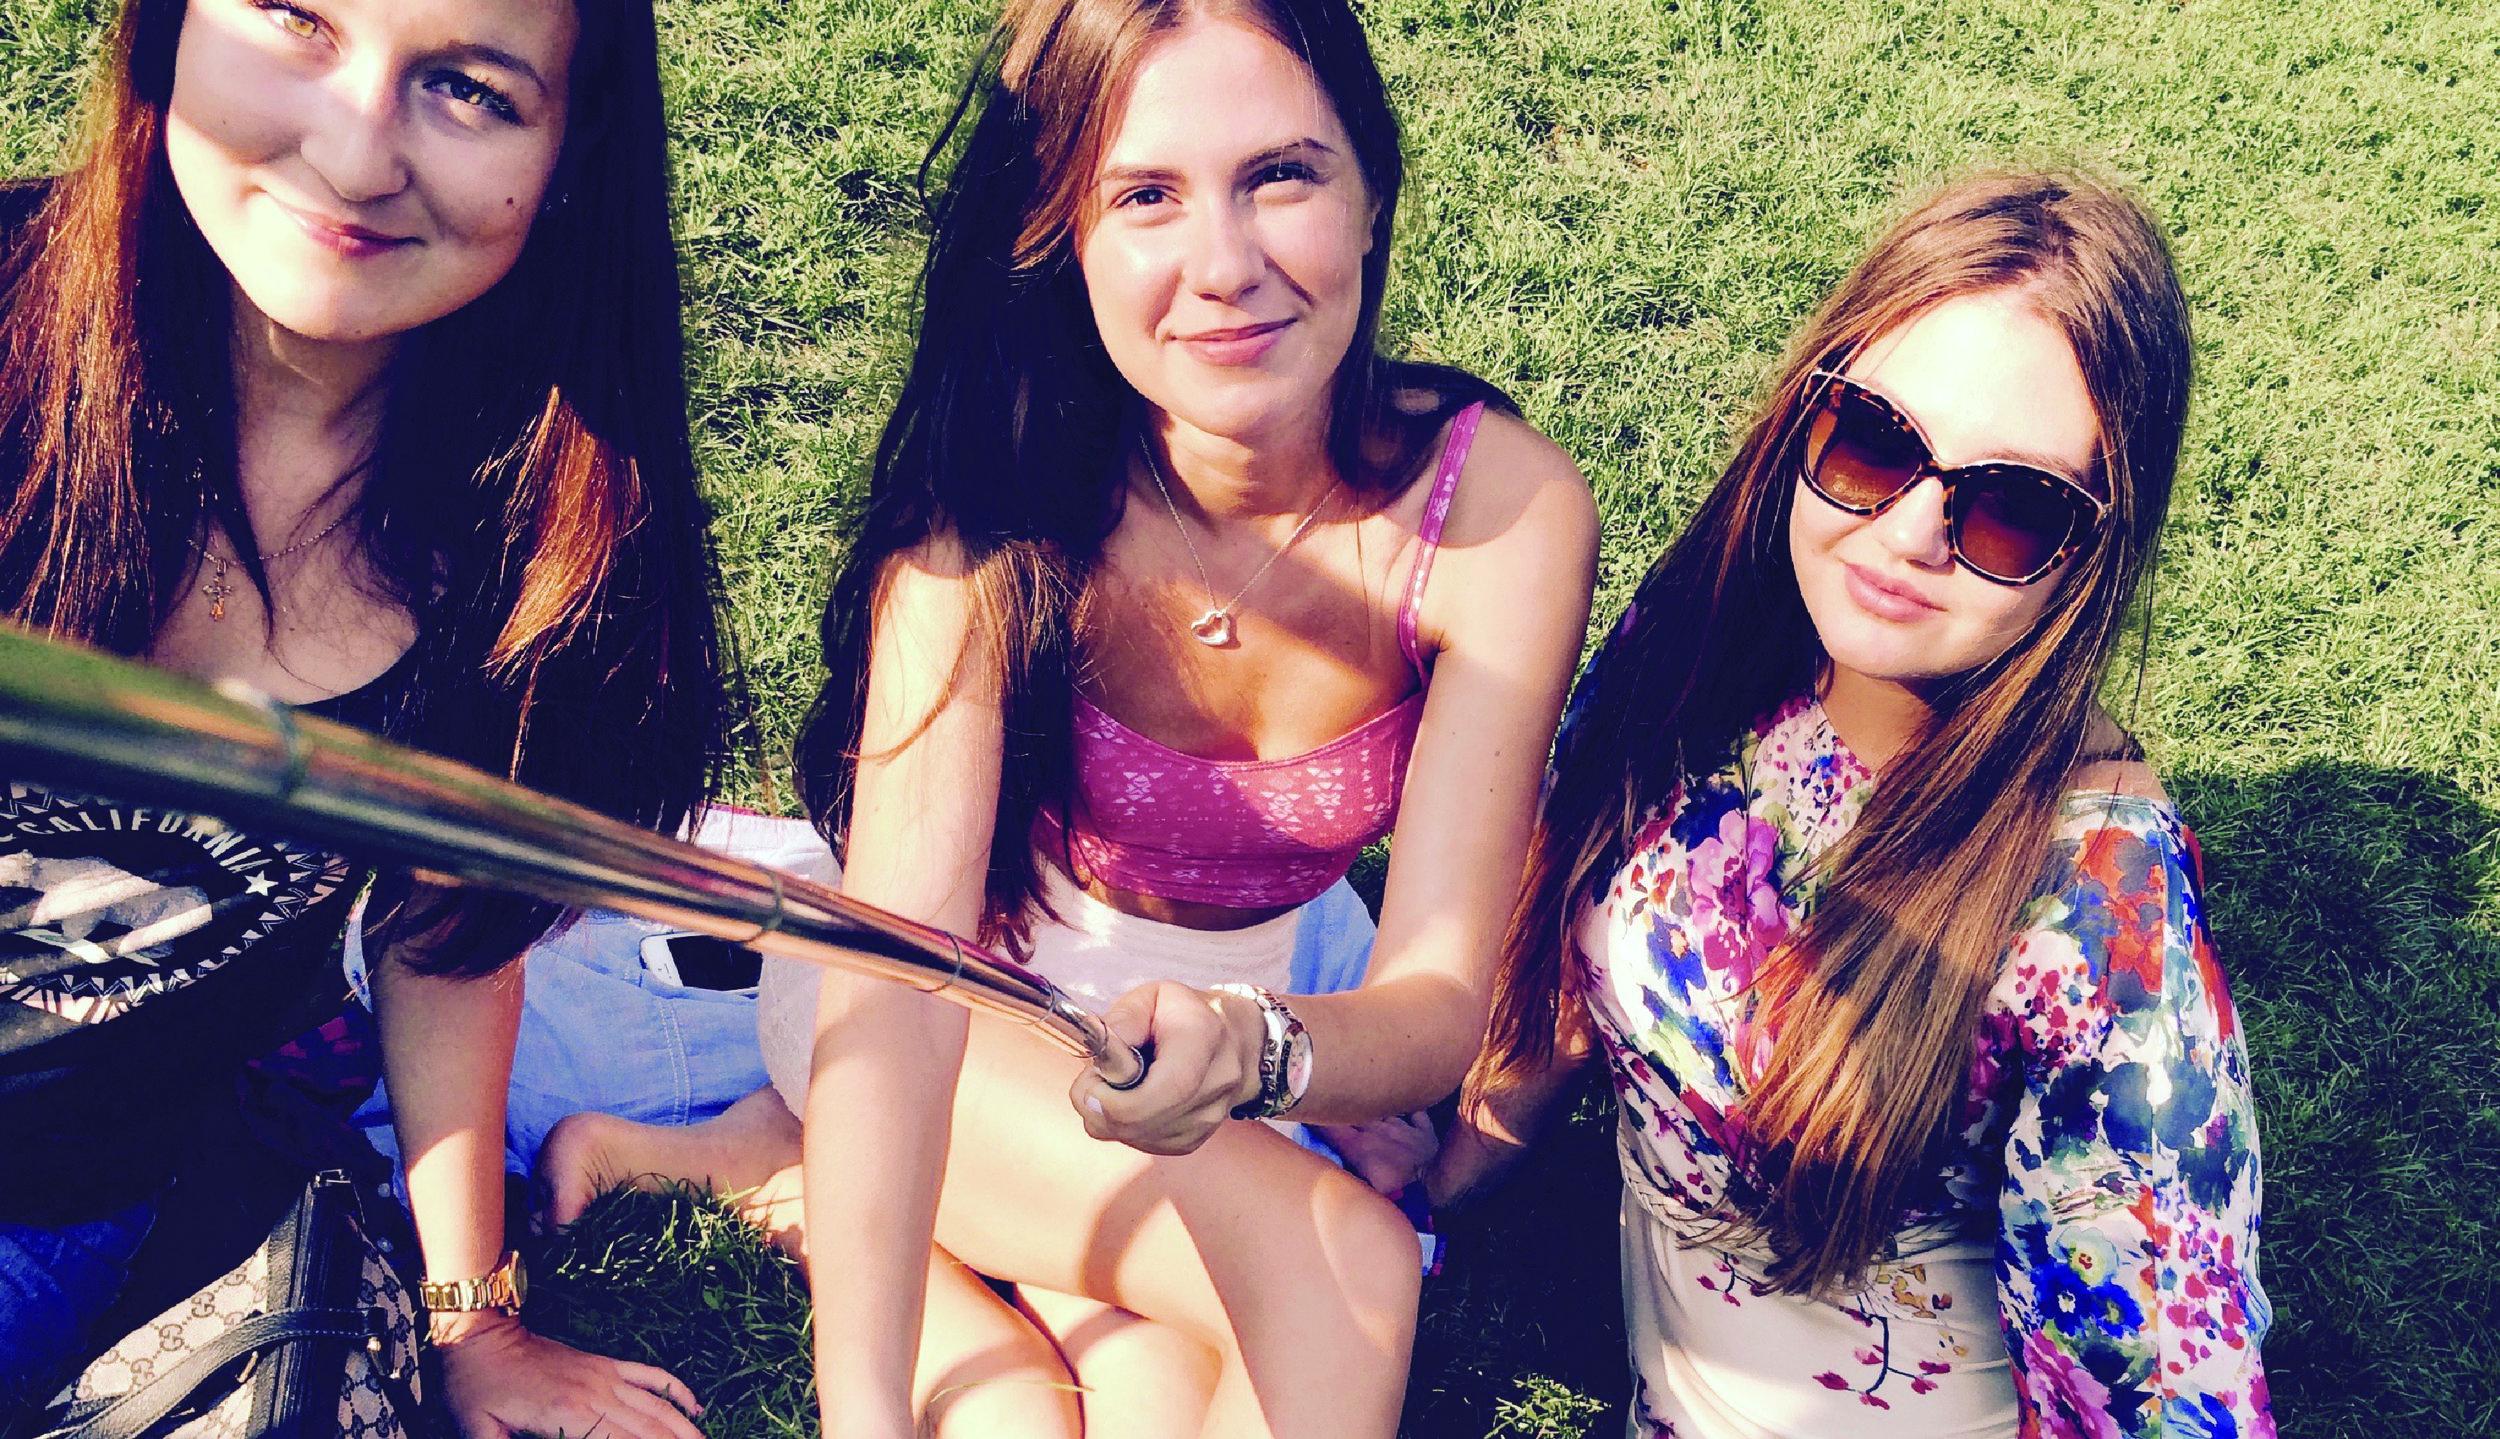 GIRLS WITH SELFIE STICK-01.jpg